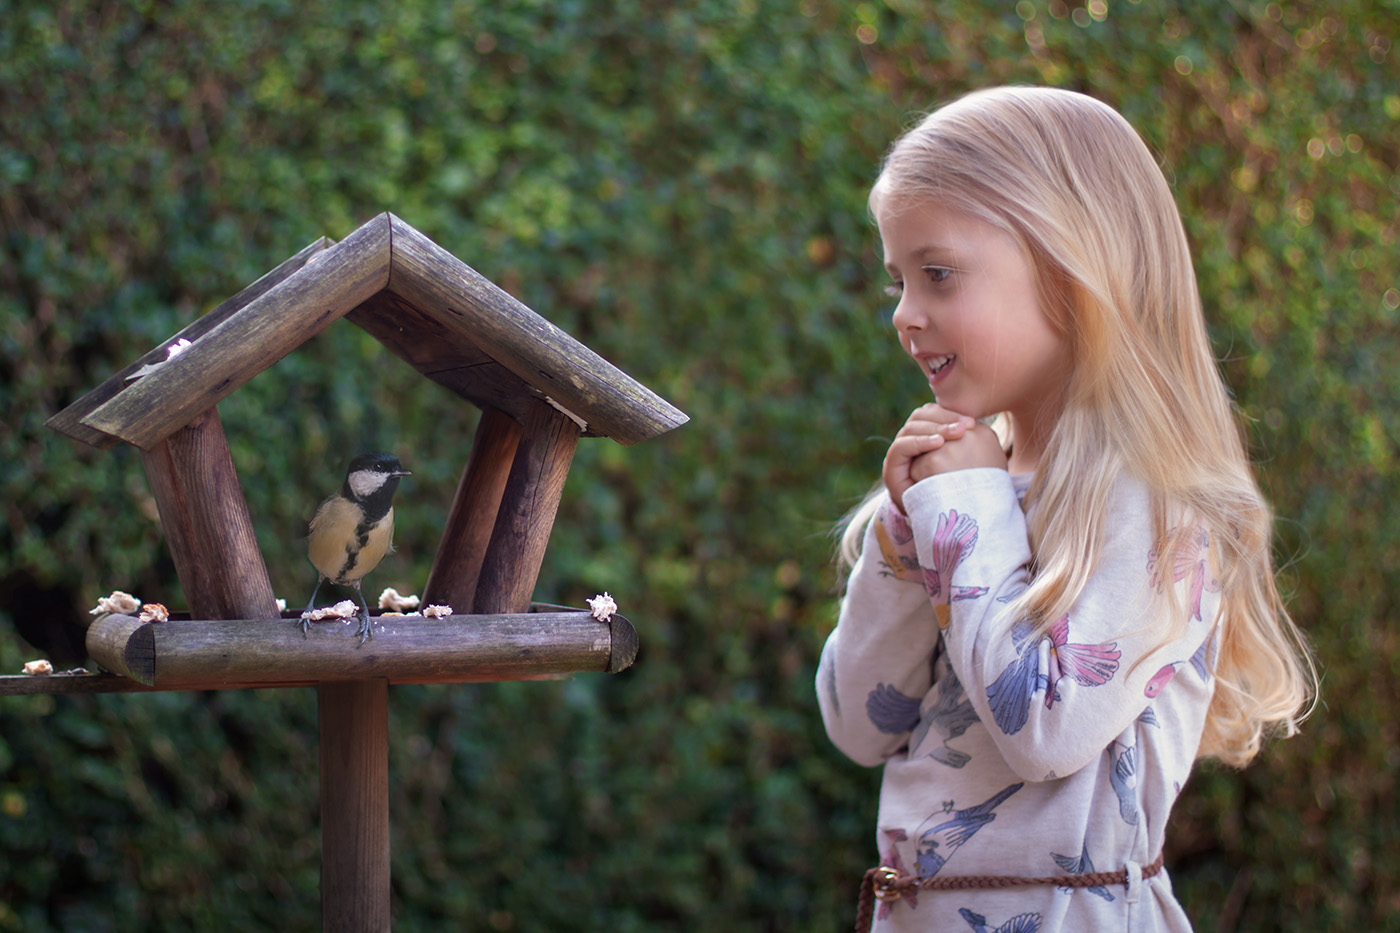 girl admiring birdhouse